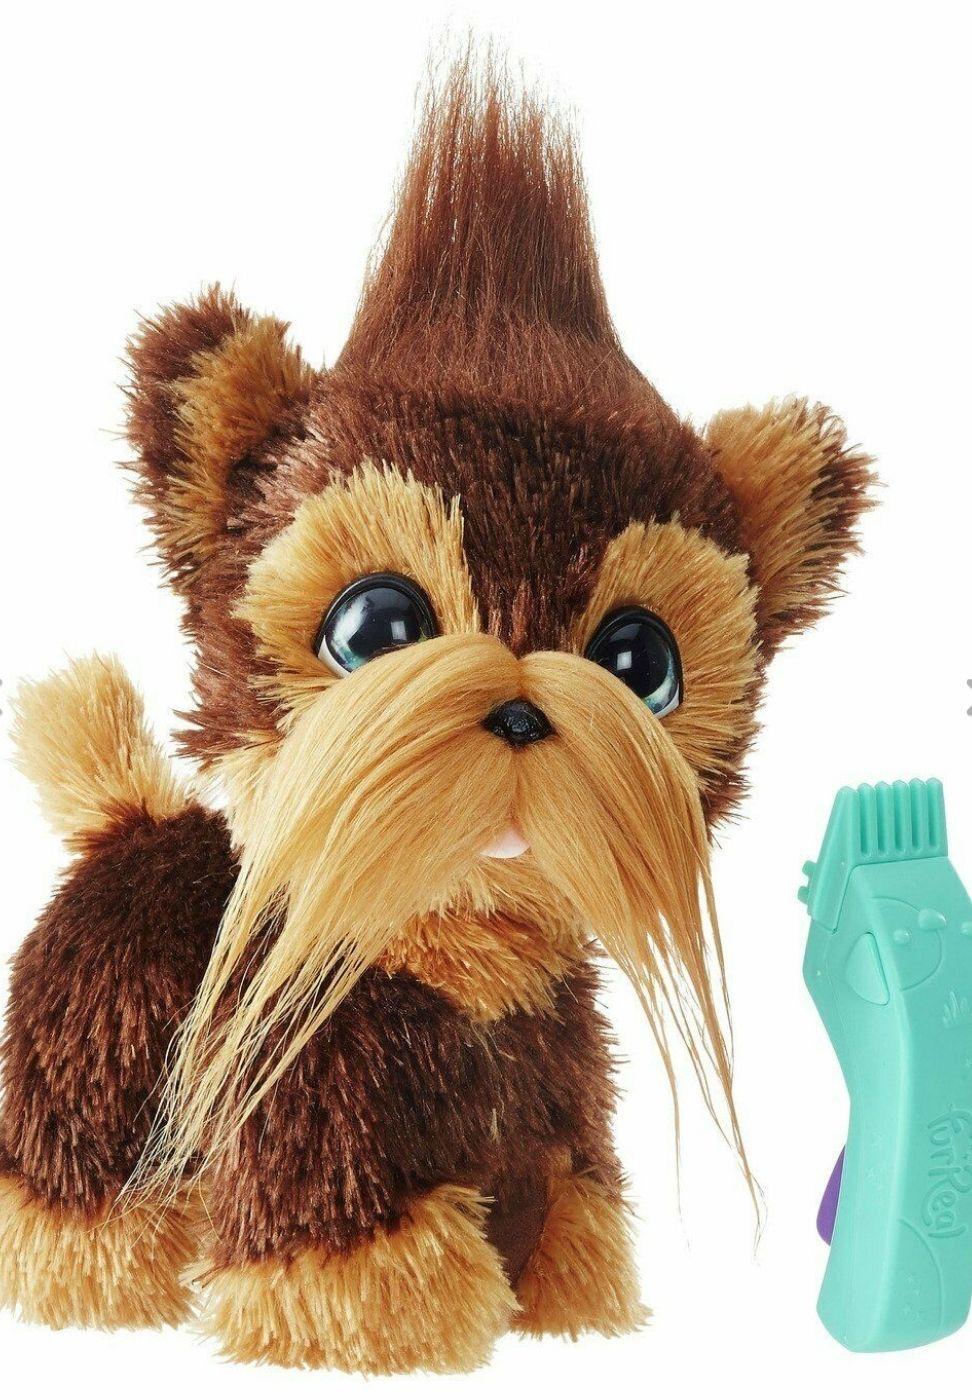 Hasbro FurReal Shaggy Shawn Pup£8.99 at Argos eBay